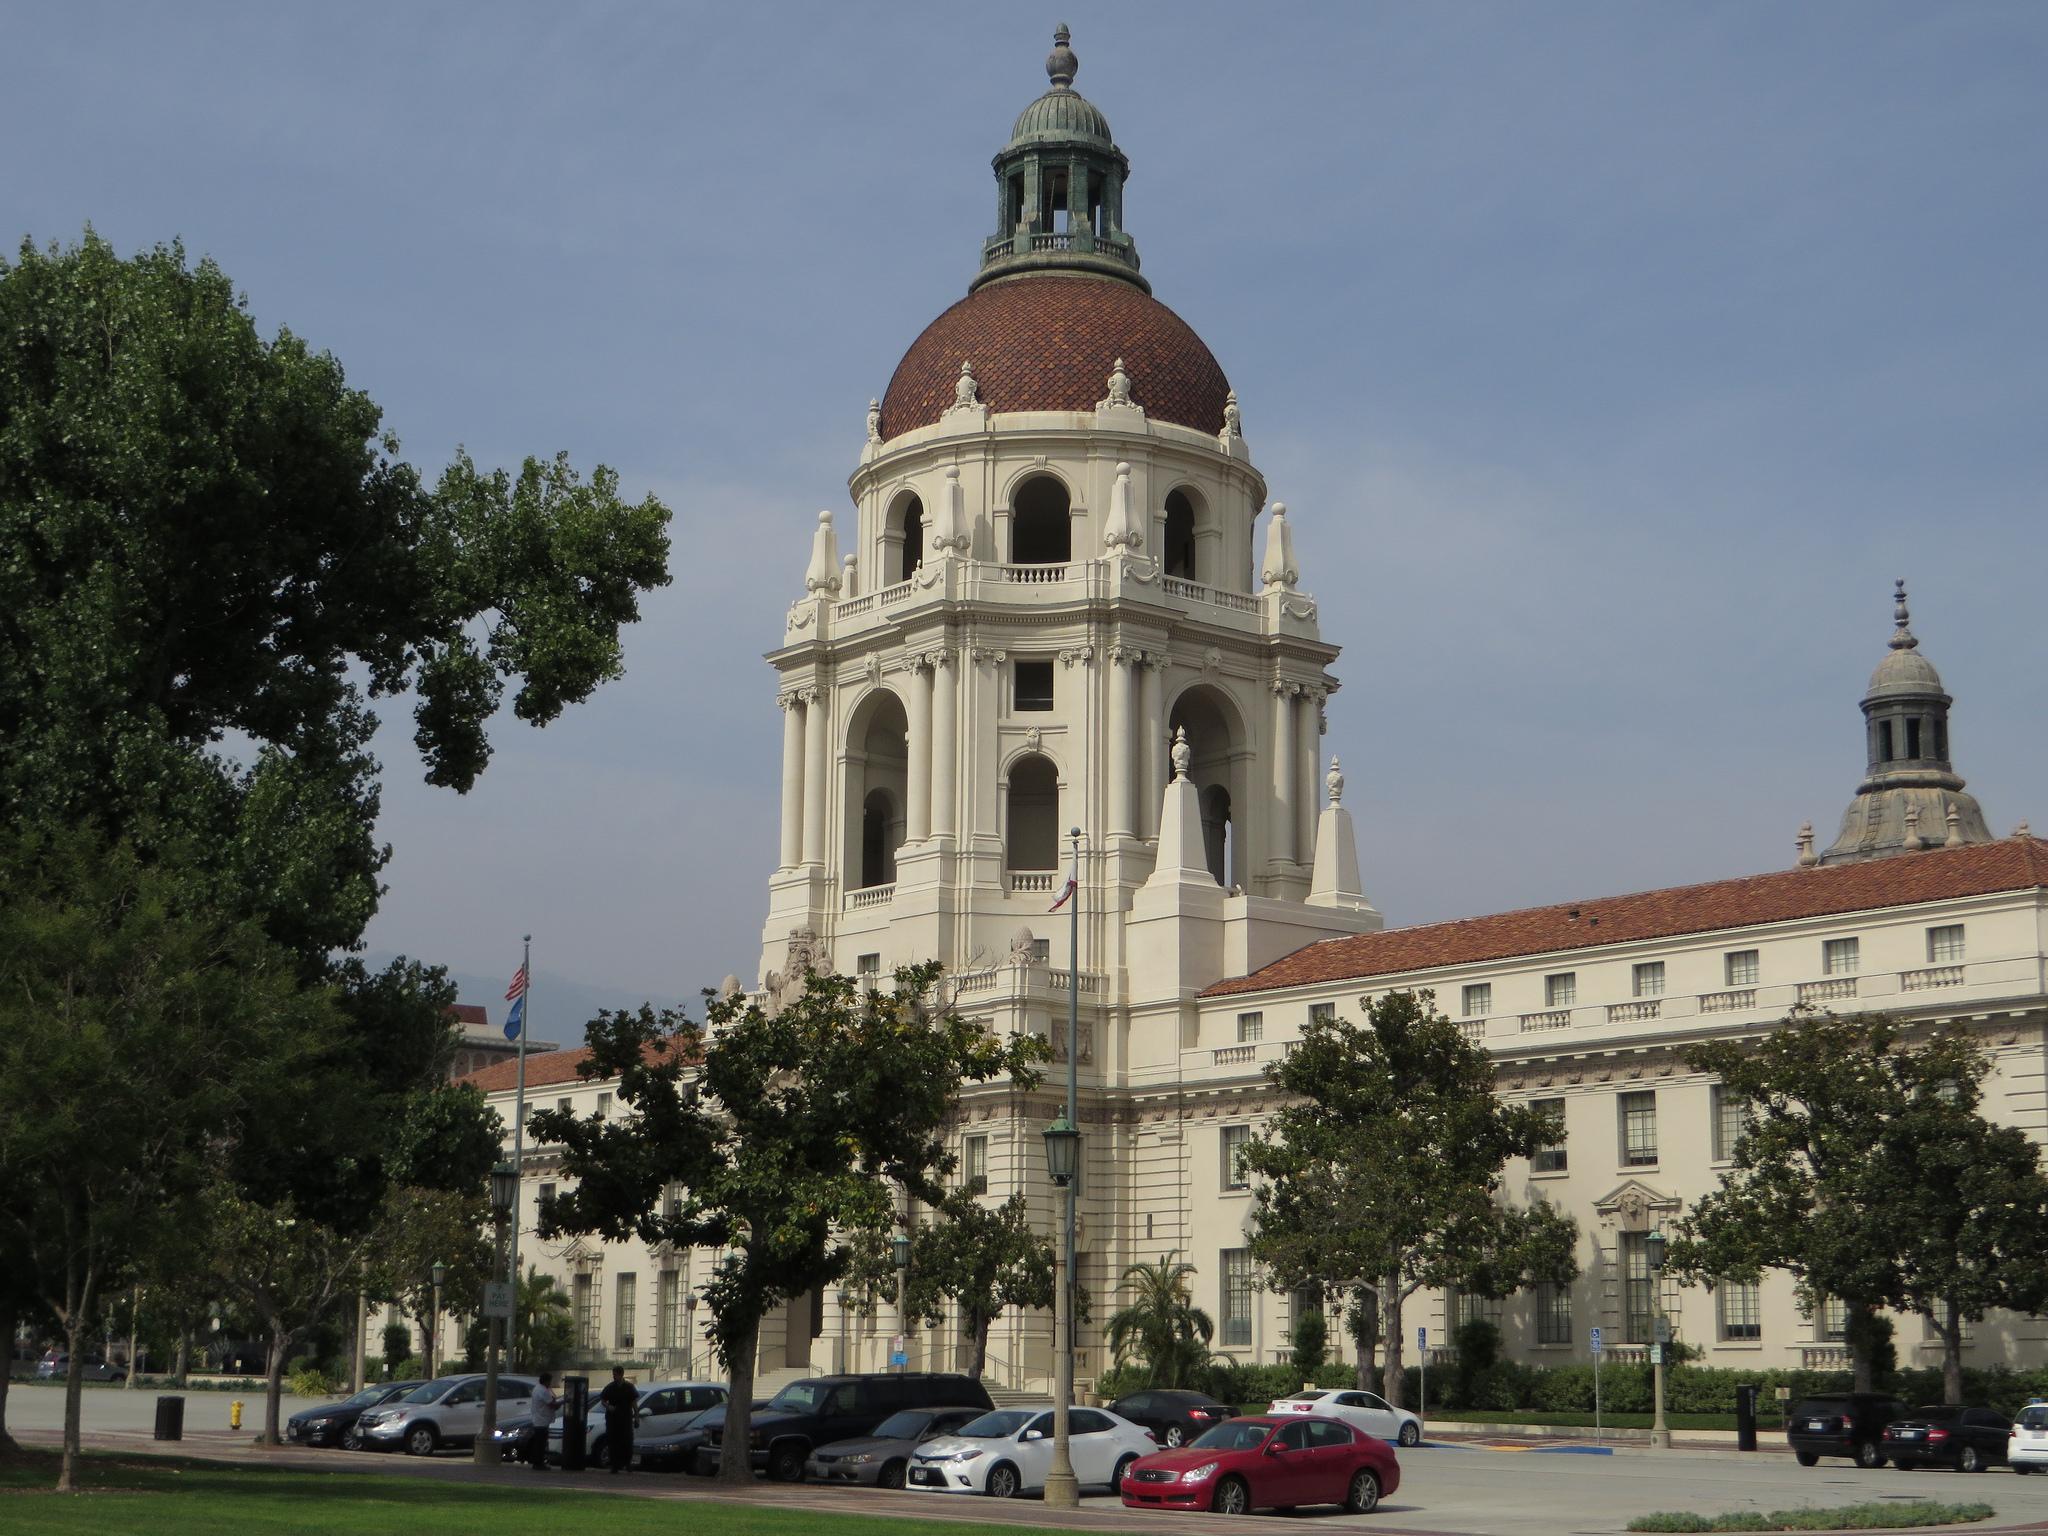 Pasadena City Hall, Pasadena, California, Ken Lund June 26, 2014